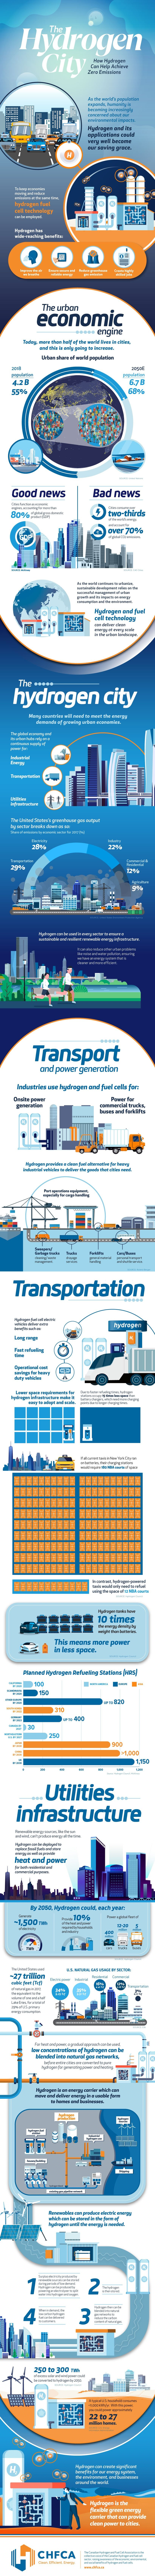 Hydrogen City info